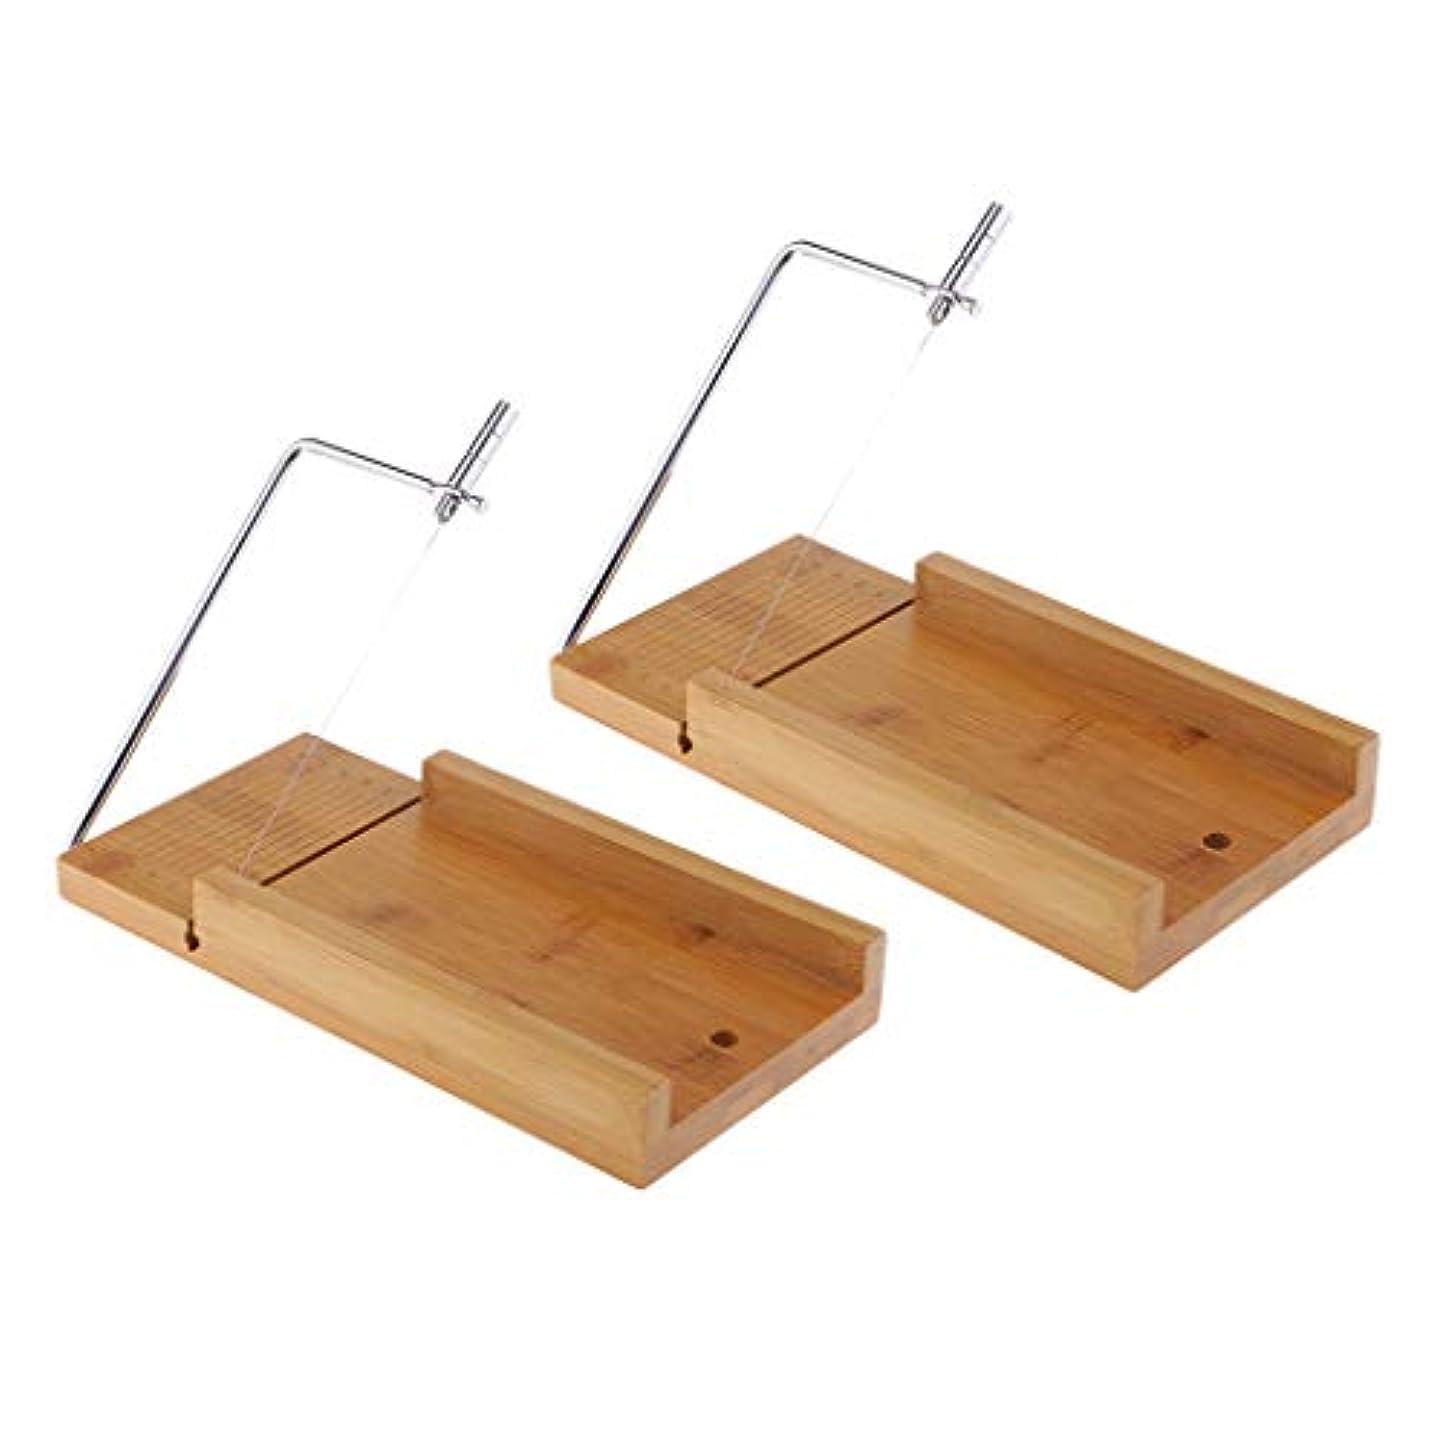 FLAMEER ソープカッター チーズナイフ ワイヤー せっけんカッター 台 木質 石鹸切削工具 2個入り